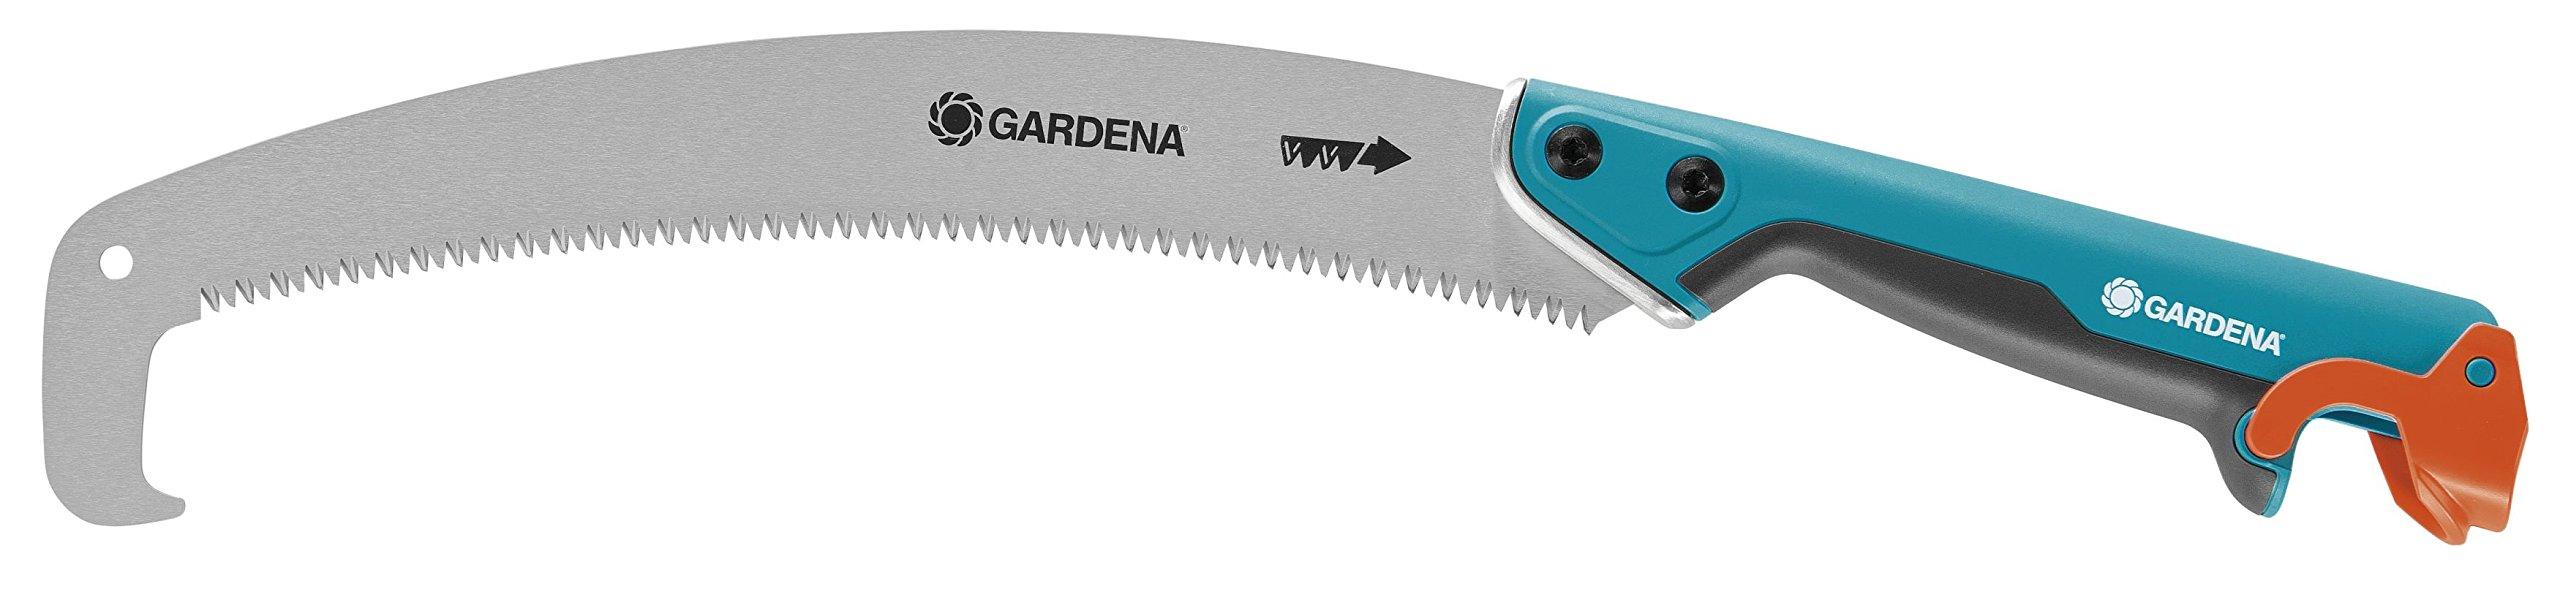 GARDENA 300P Mechanical Curved Garden Saw